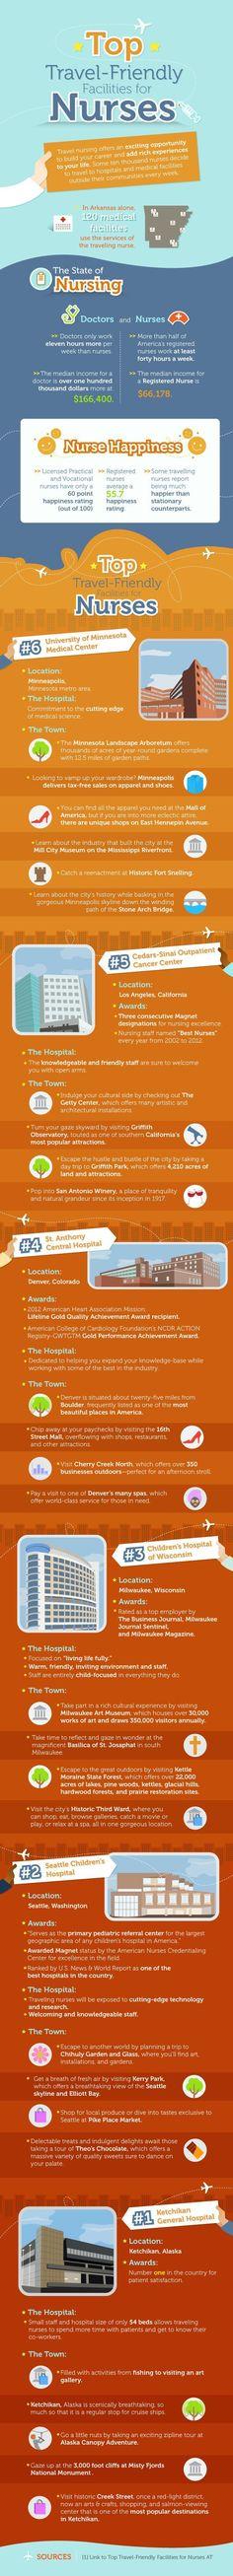 Top Tavel-friendly facilities for Nurses